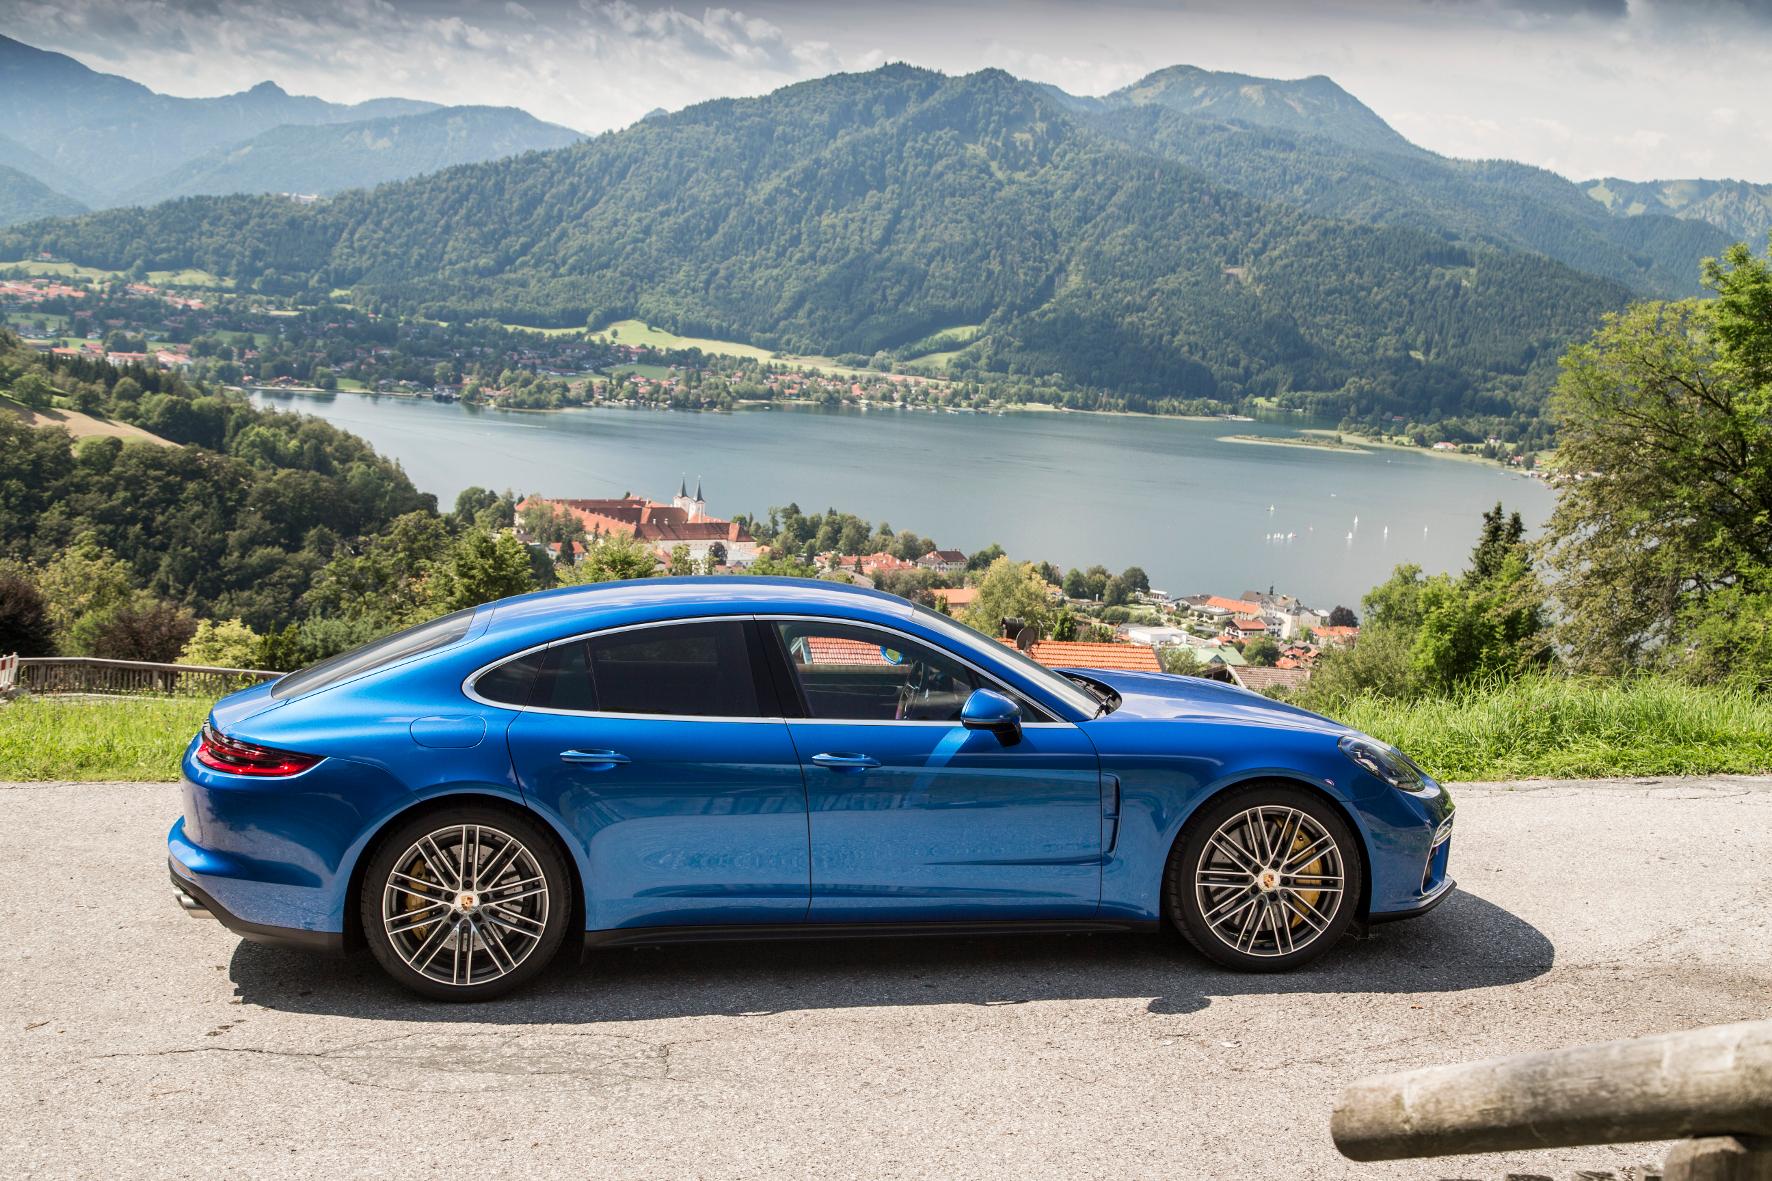 mid Tegernsee - Natur-Schauspiel: Das Topmodell Panamera Turbo kostet 153.011 Euro.